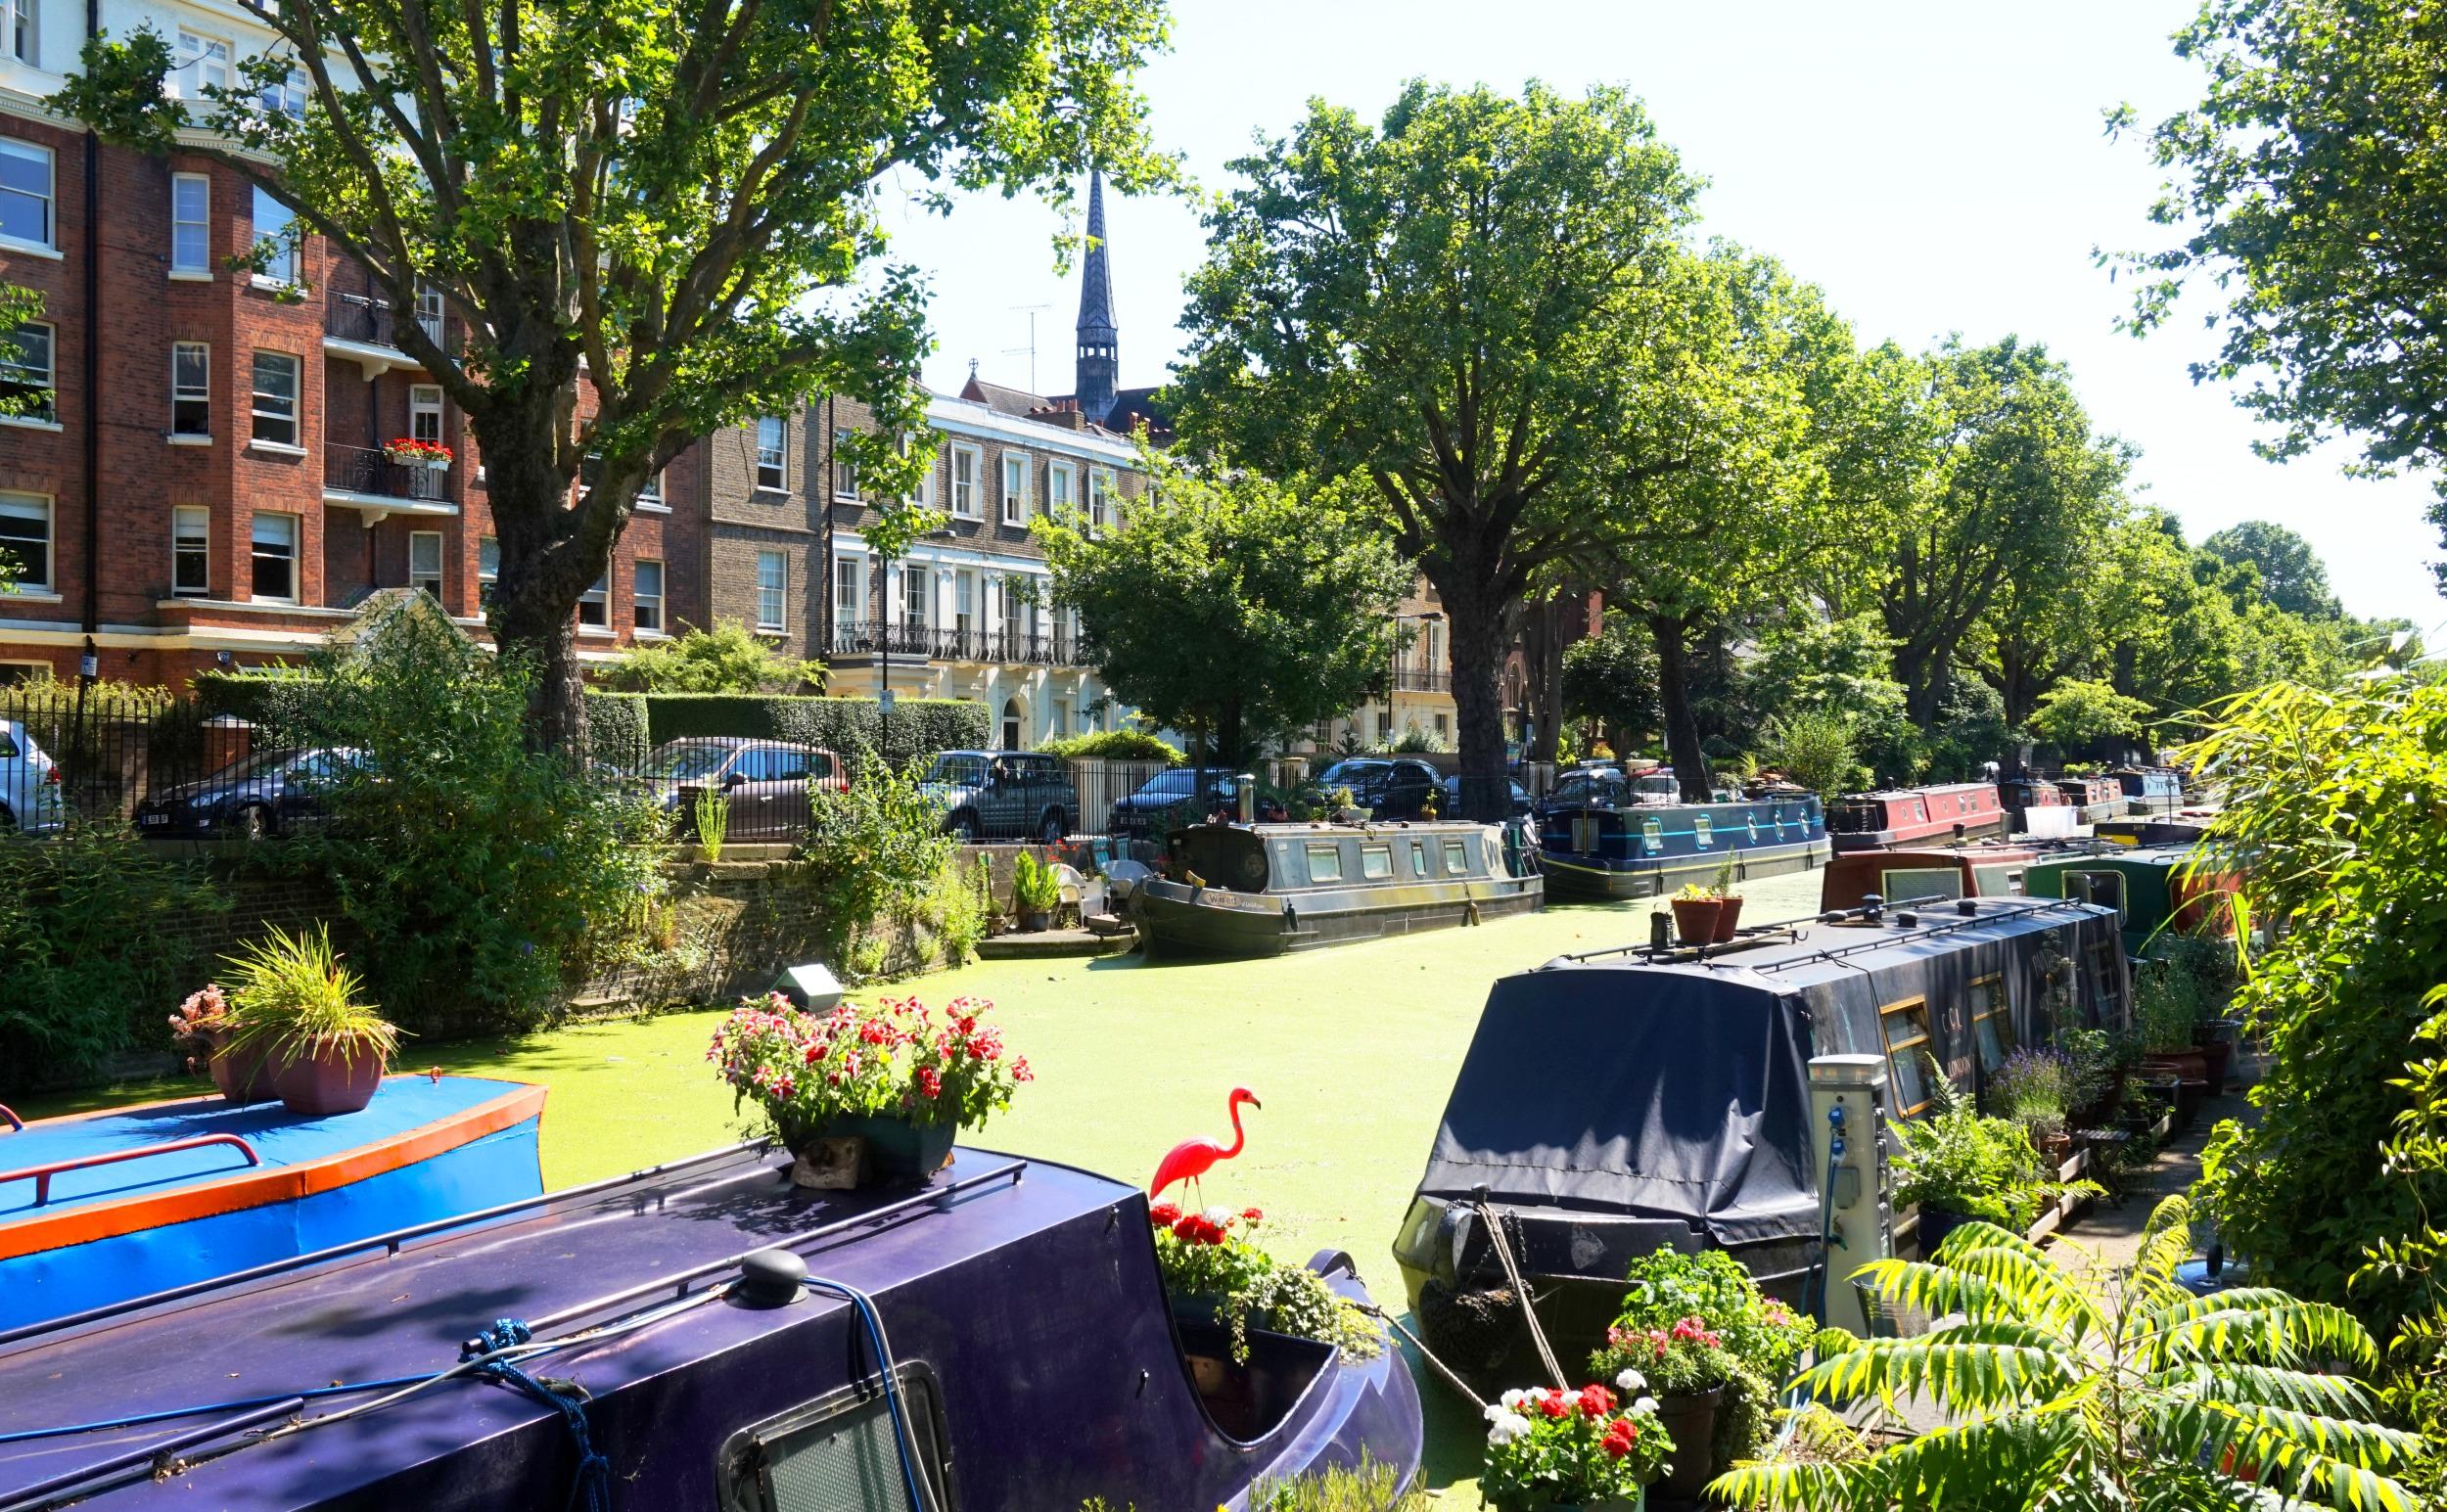 Regents-Canal-27